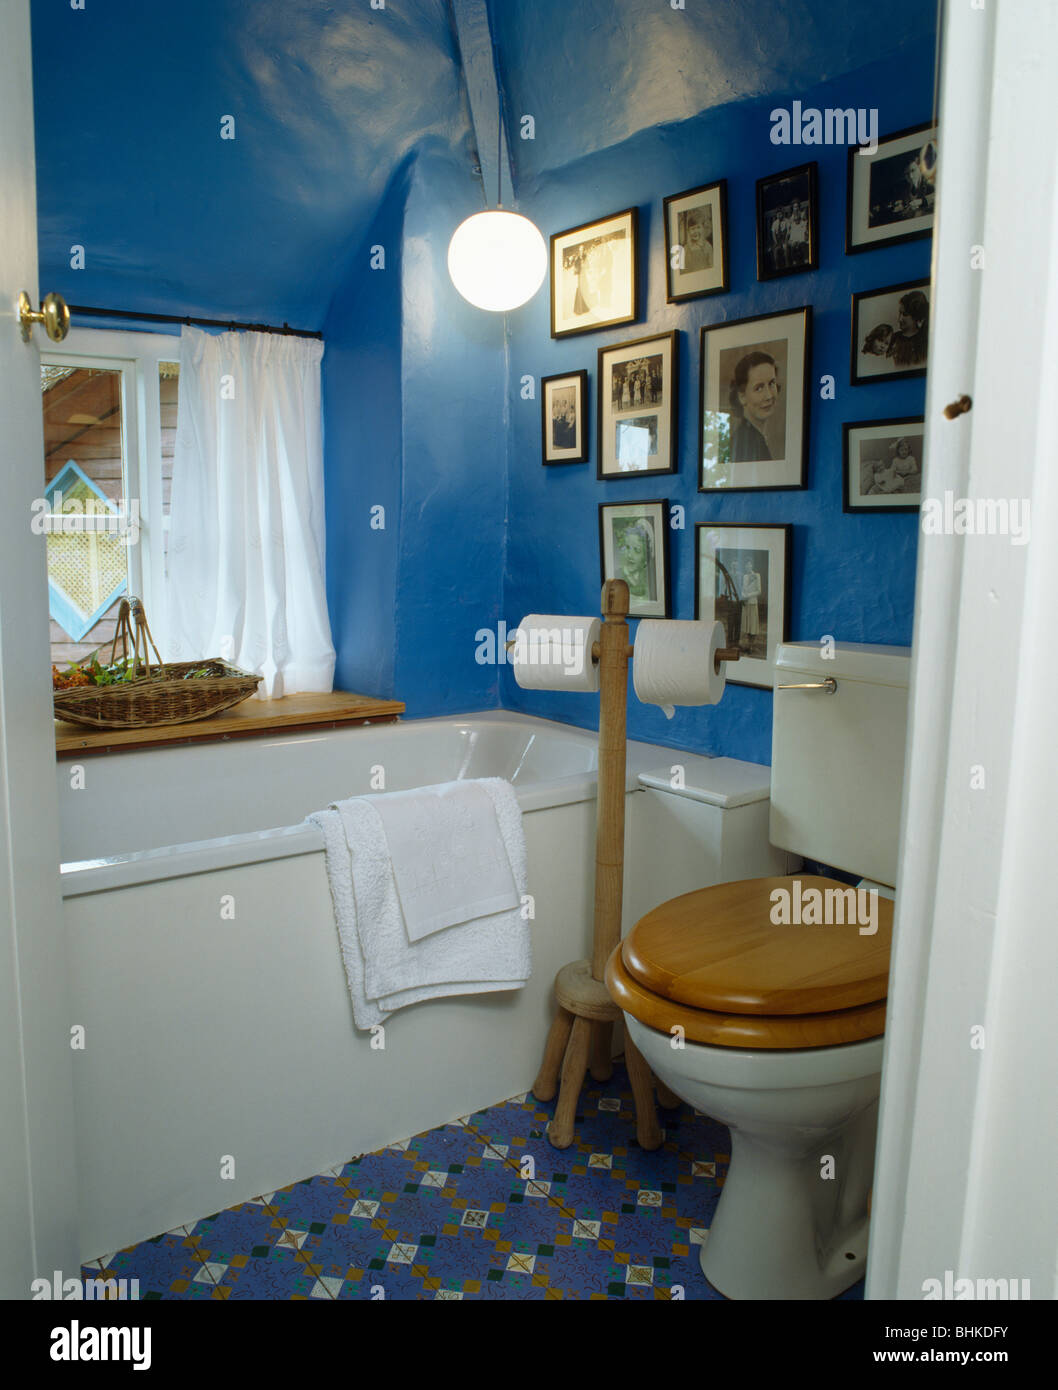 Attics Bathrooms Country Interiors Stock Photos & Attics Bathrooms ...